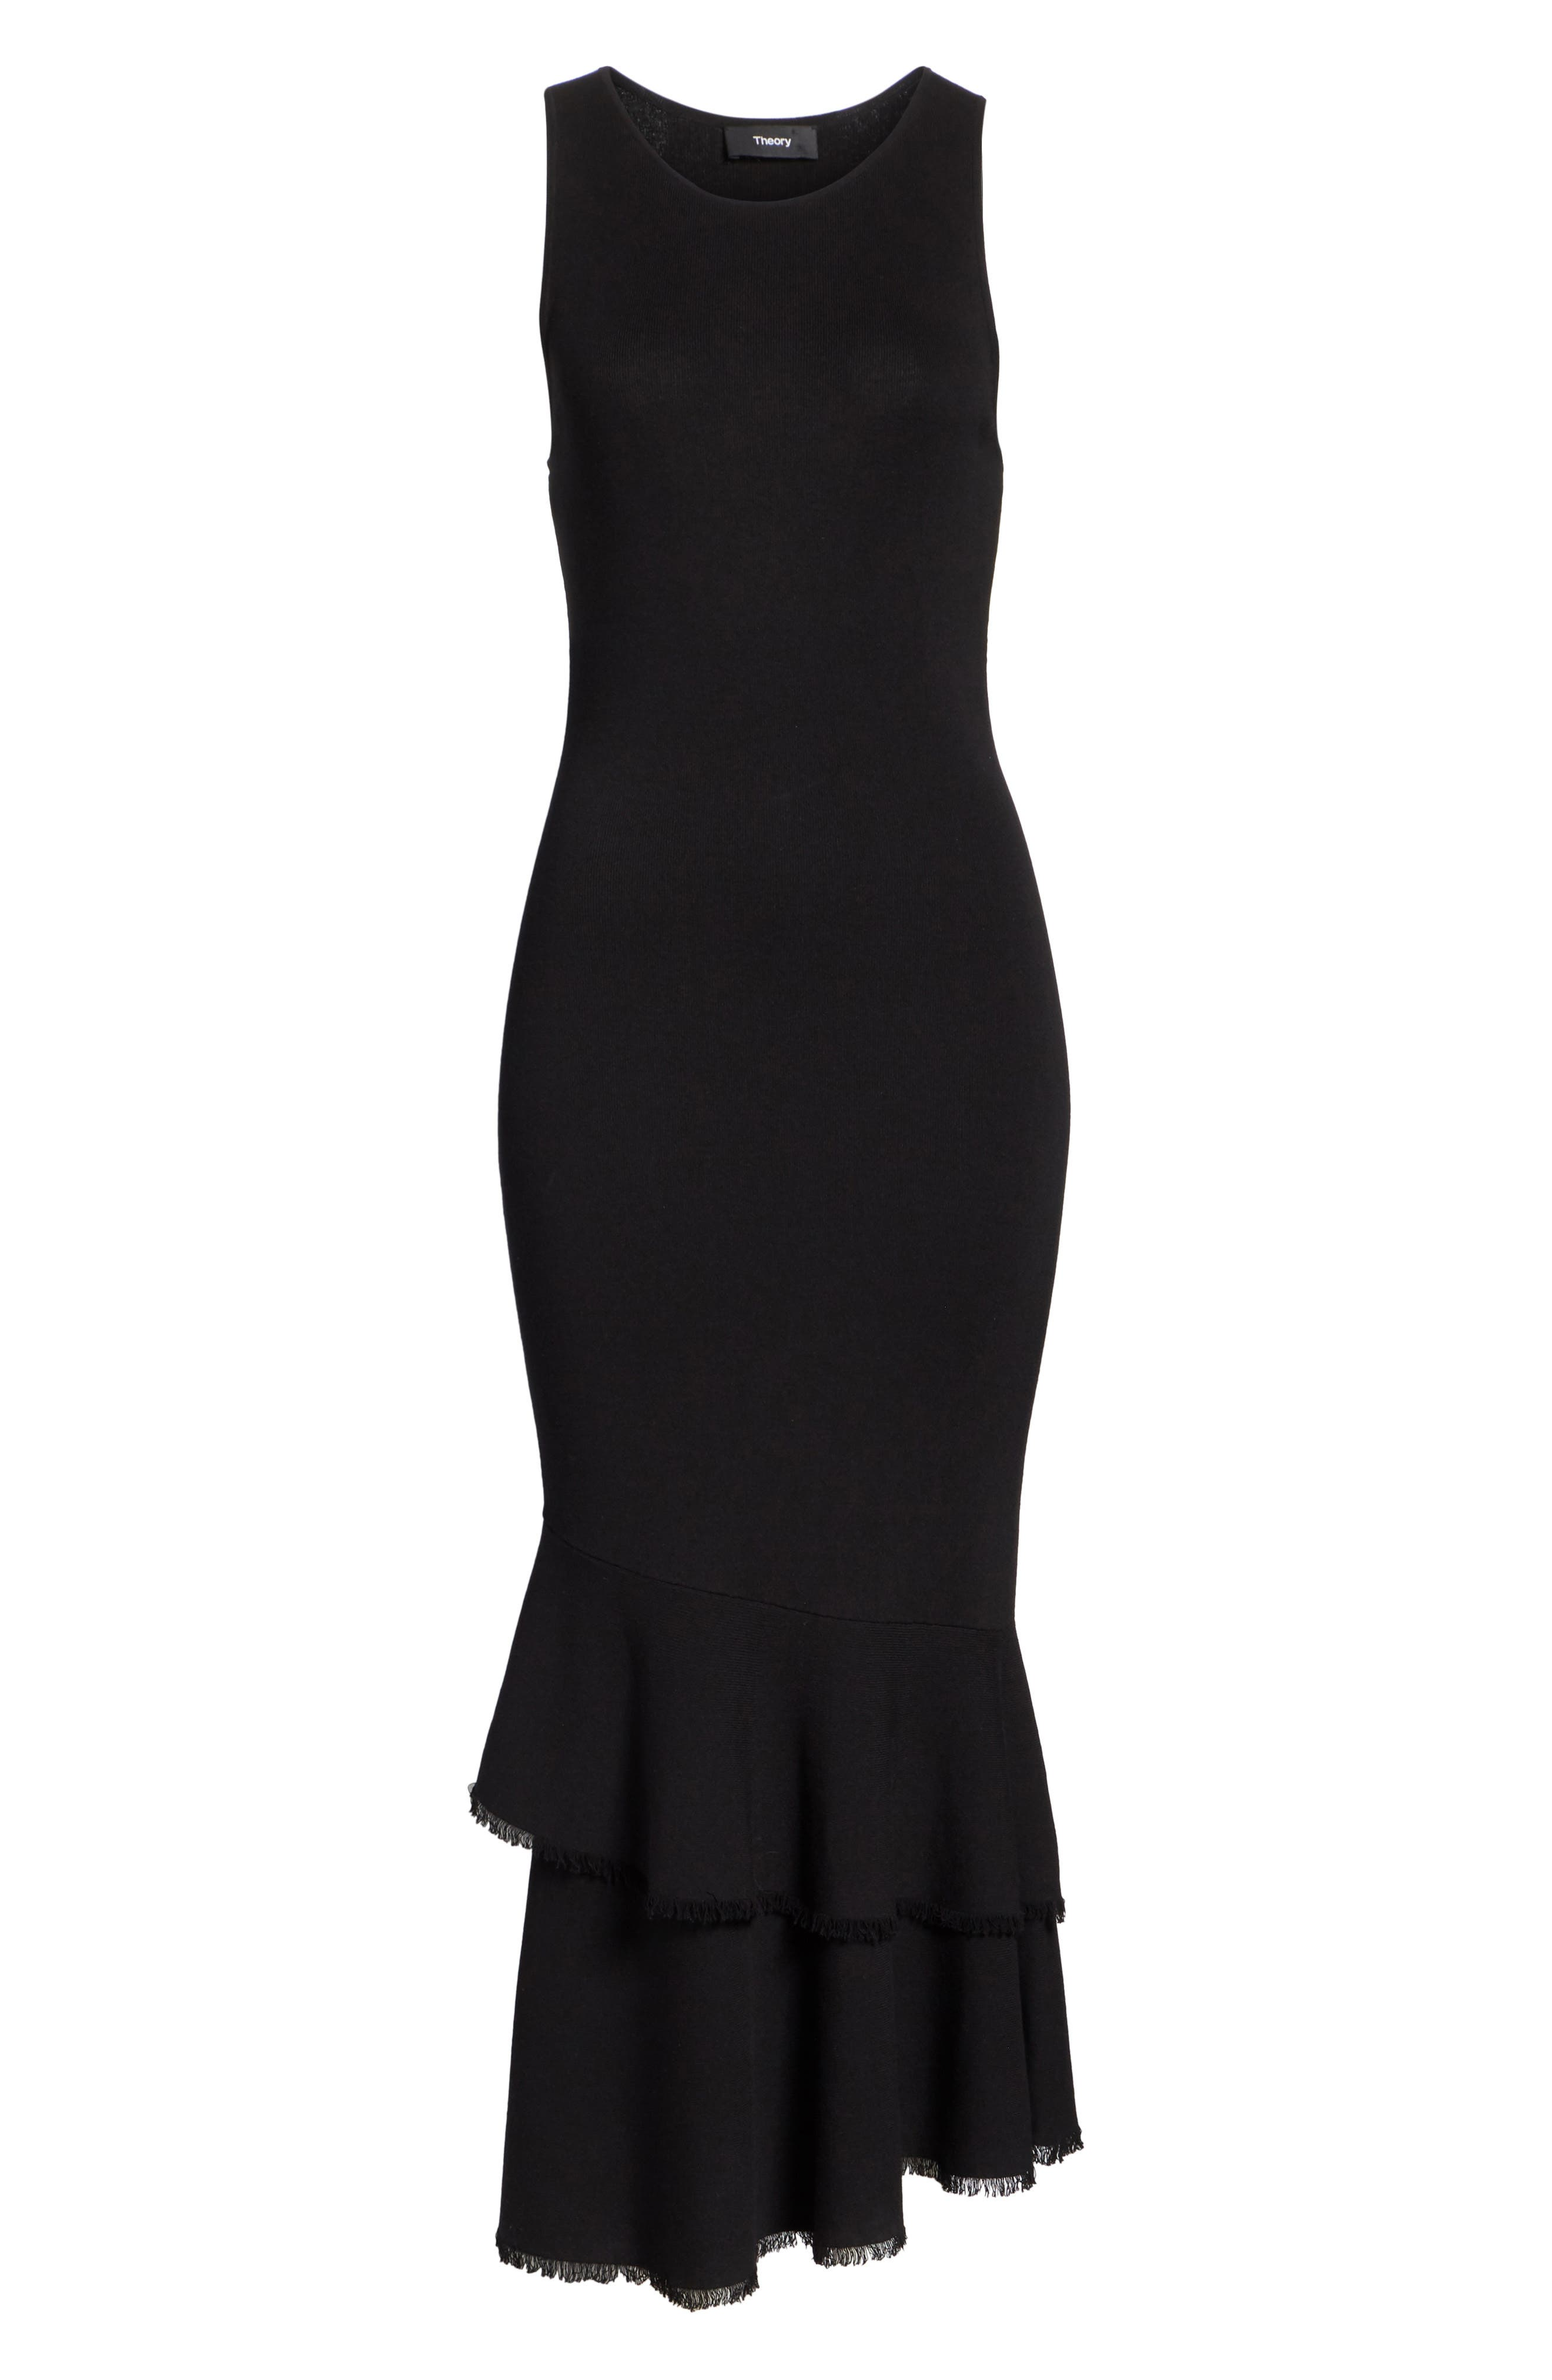 Nilimary Prosecco Midi Dress,                             Alternate thumbnail 6, color,                             Black